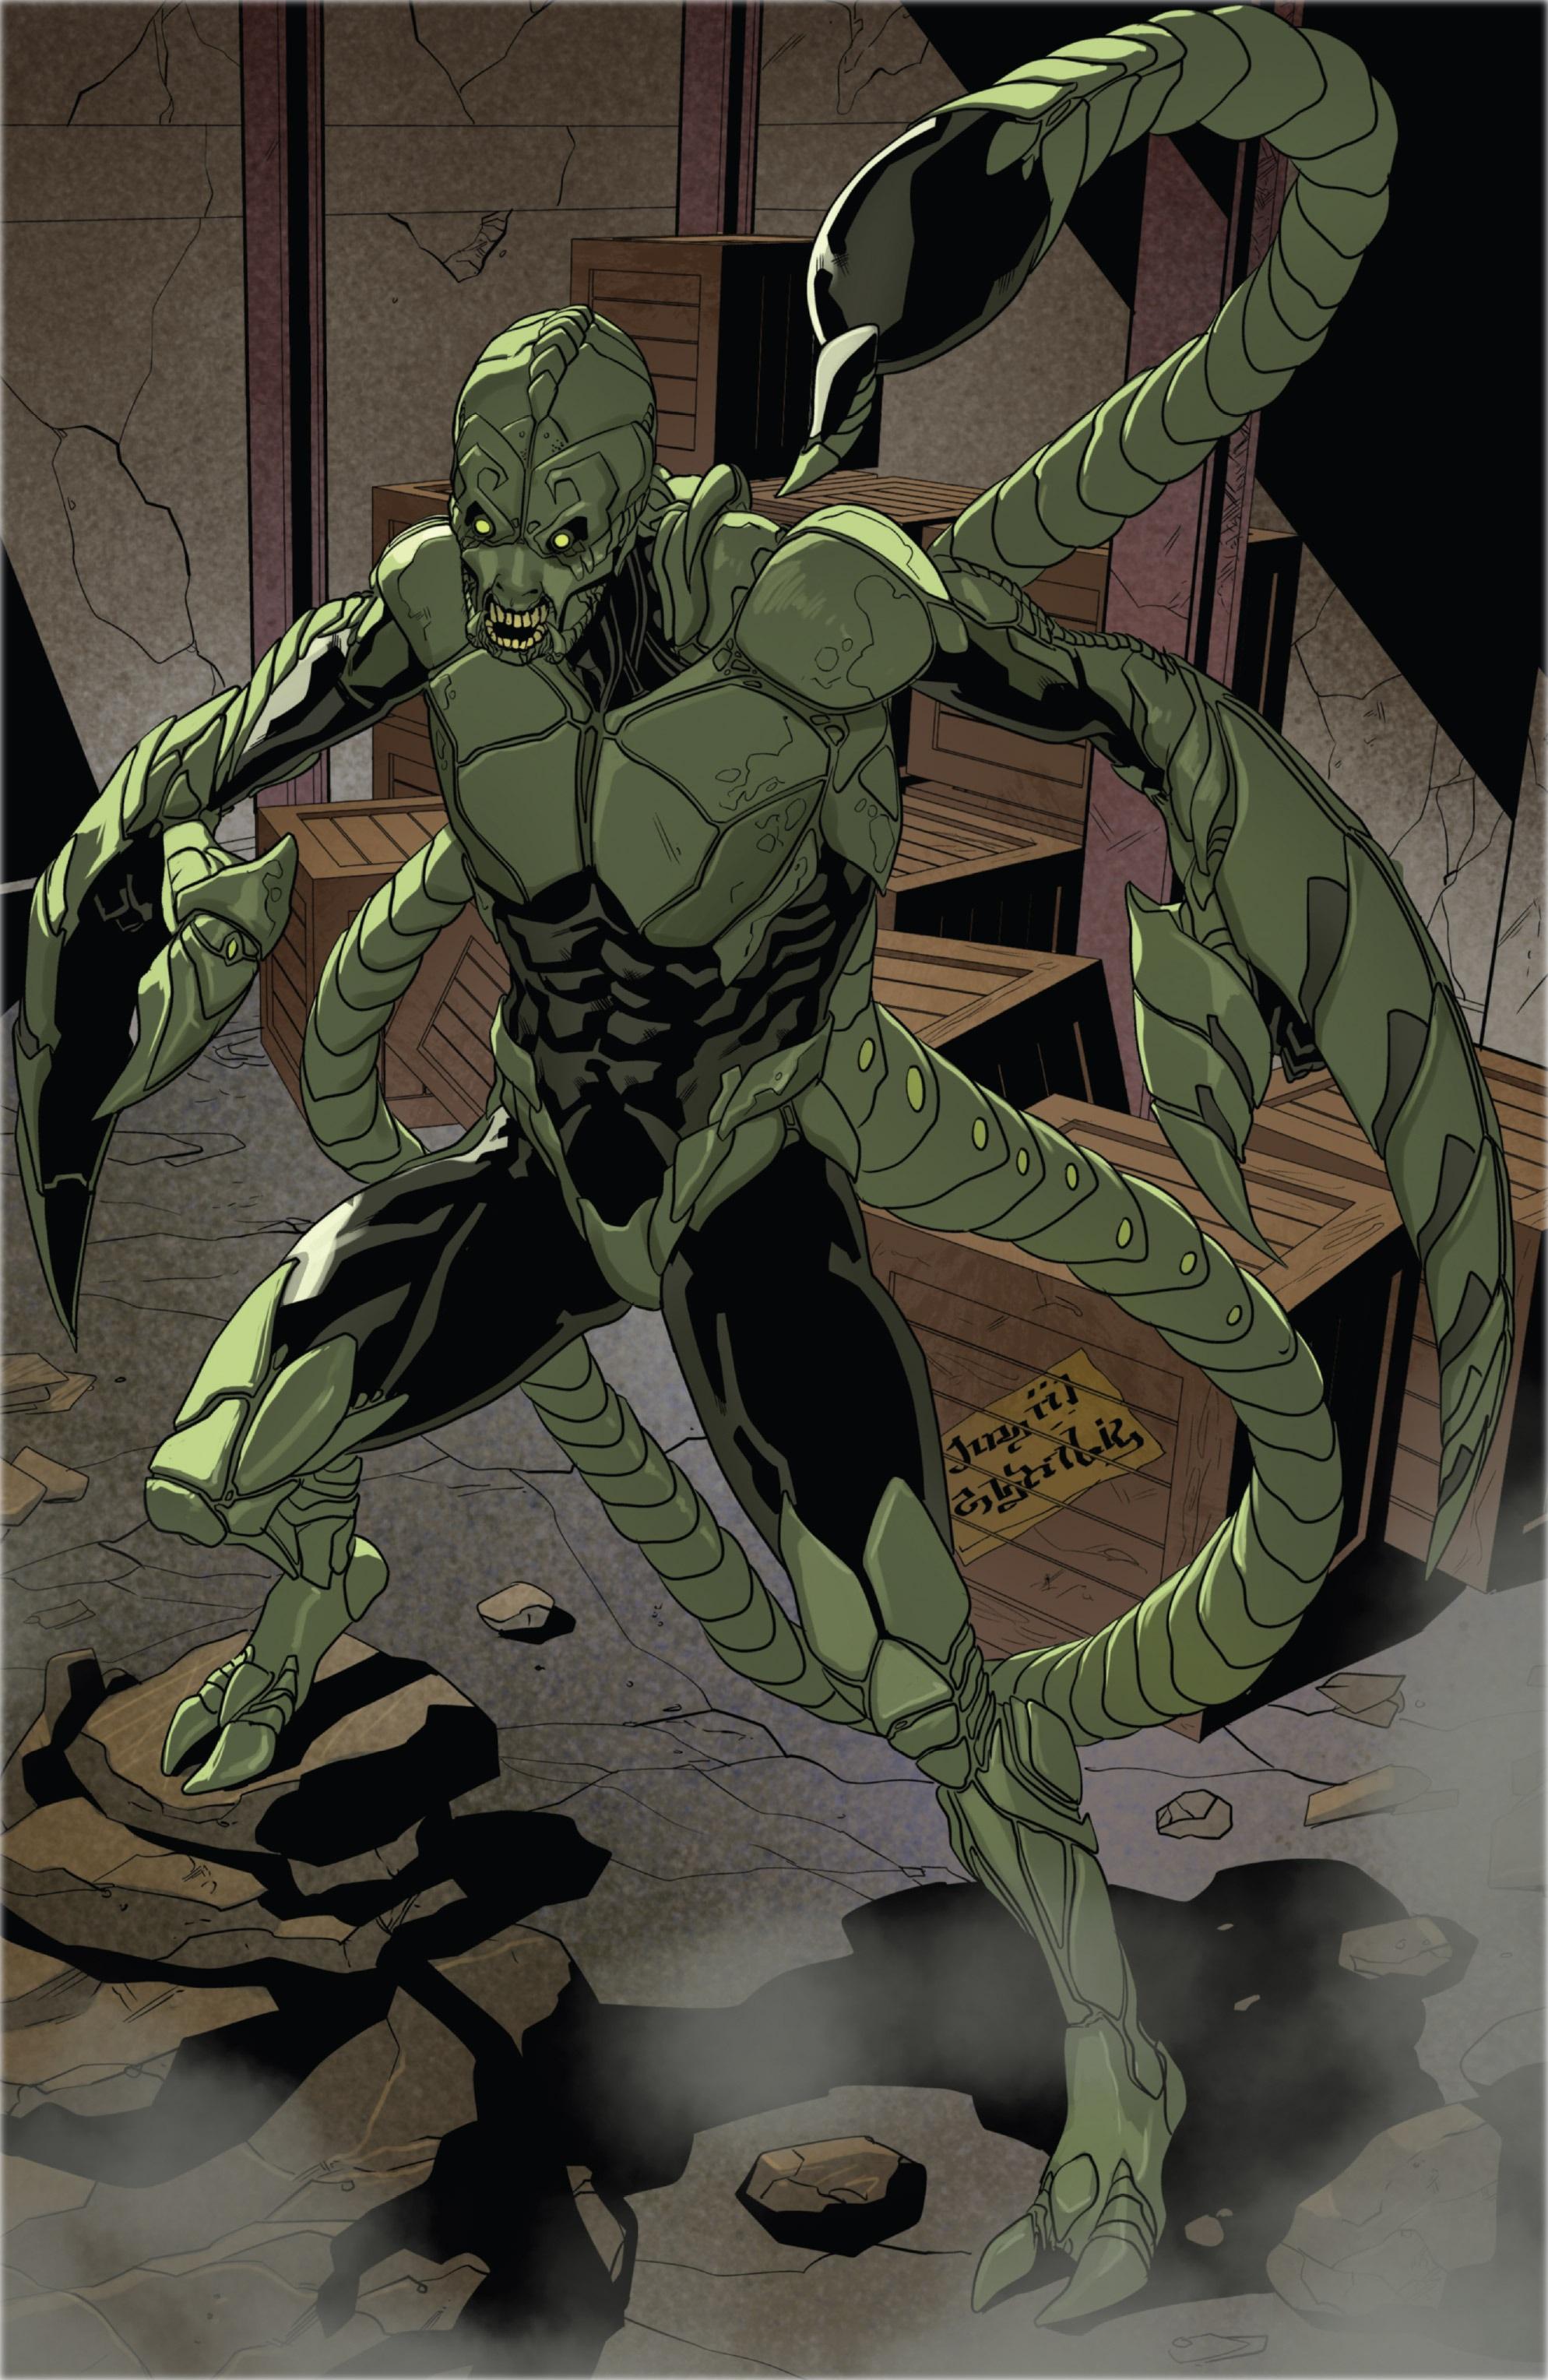 Скорпион марвел картинки